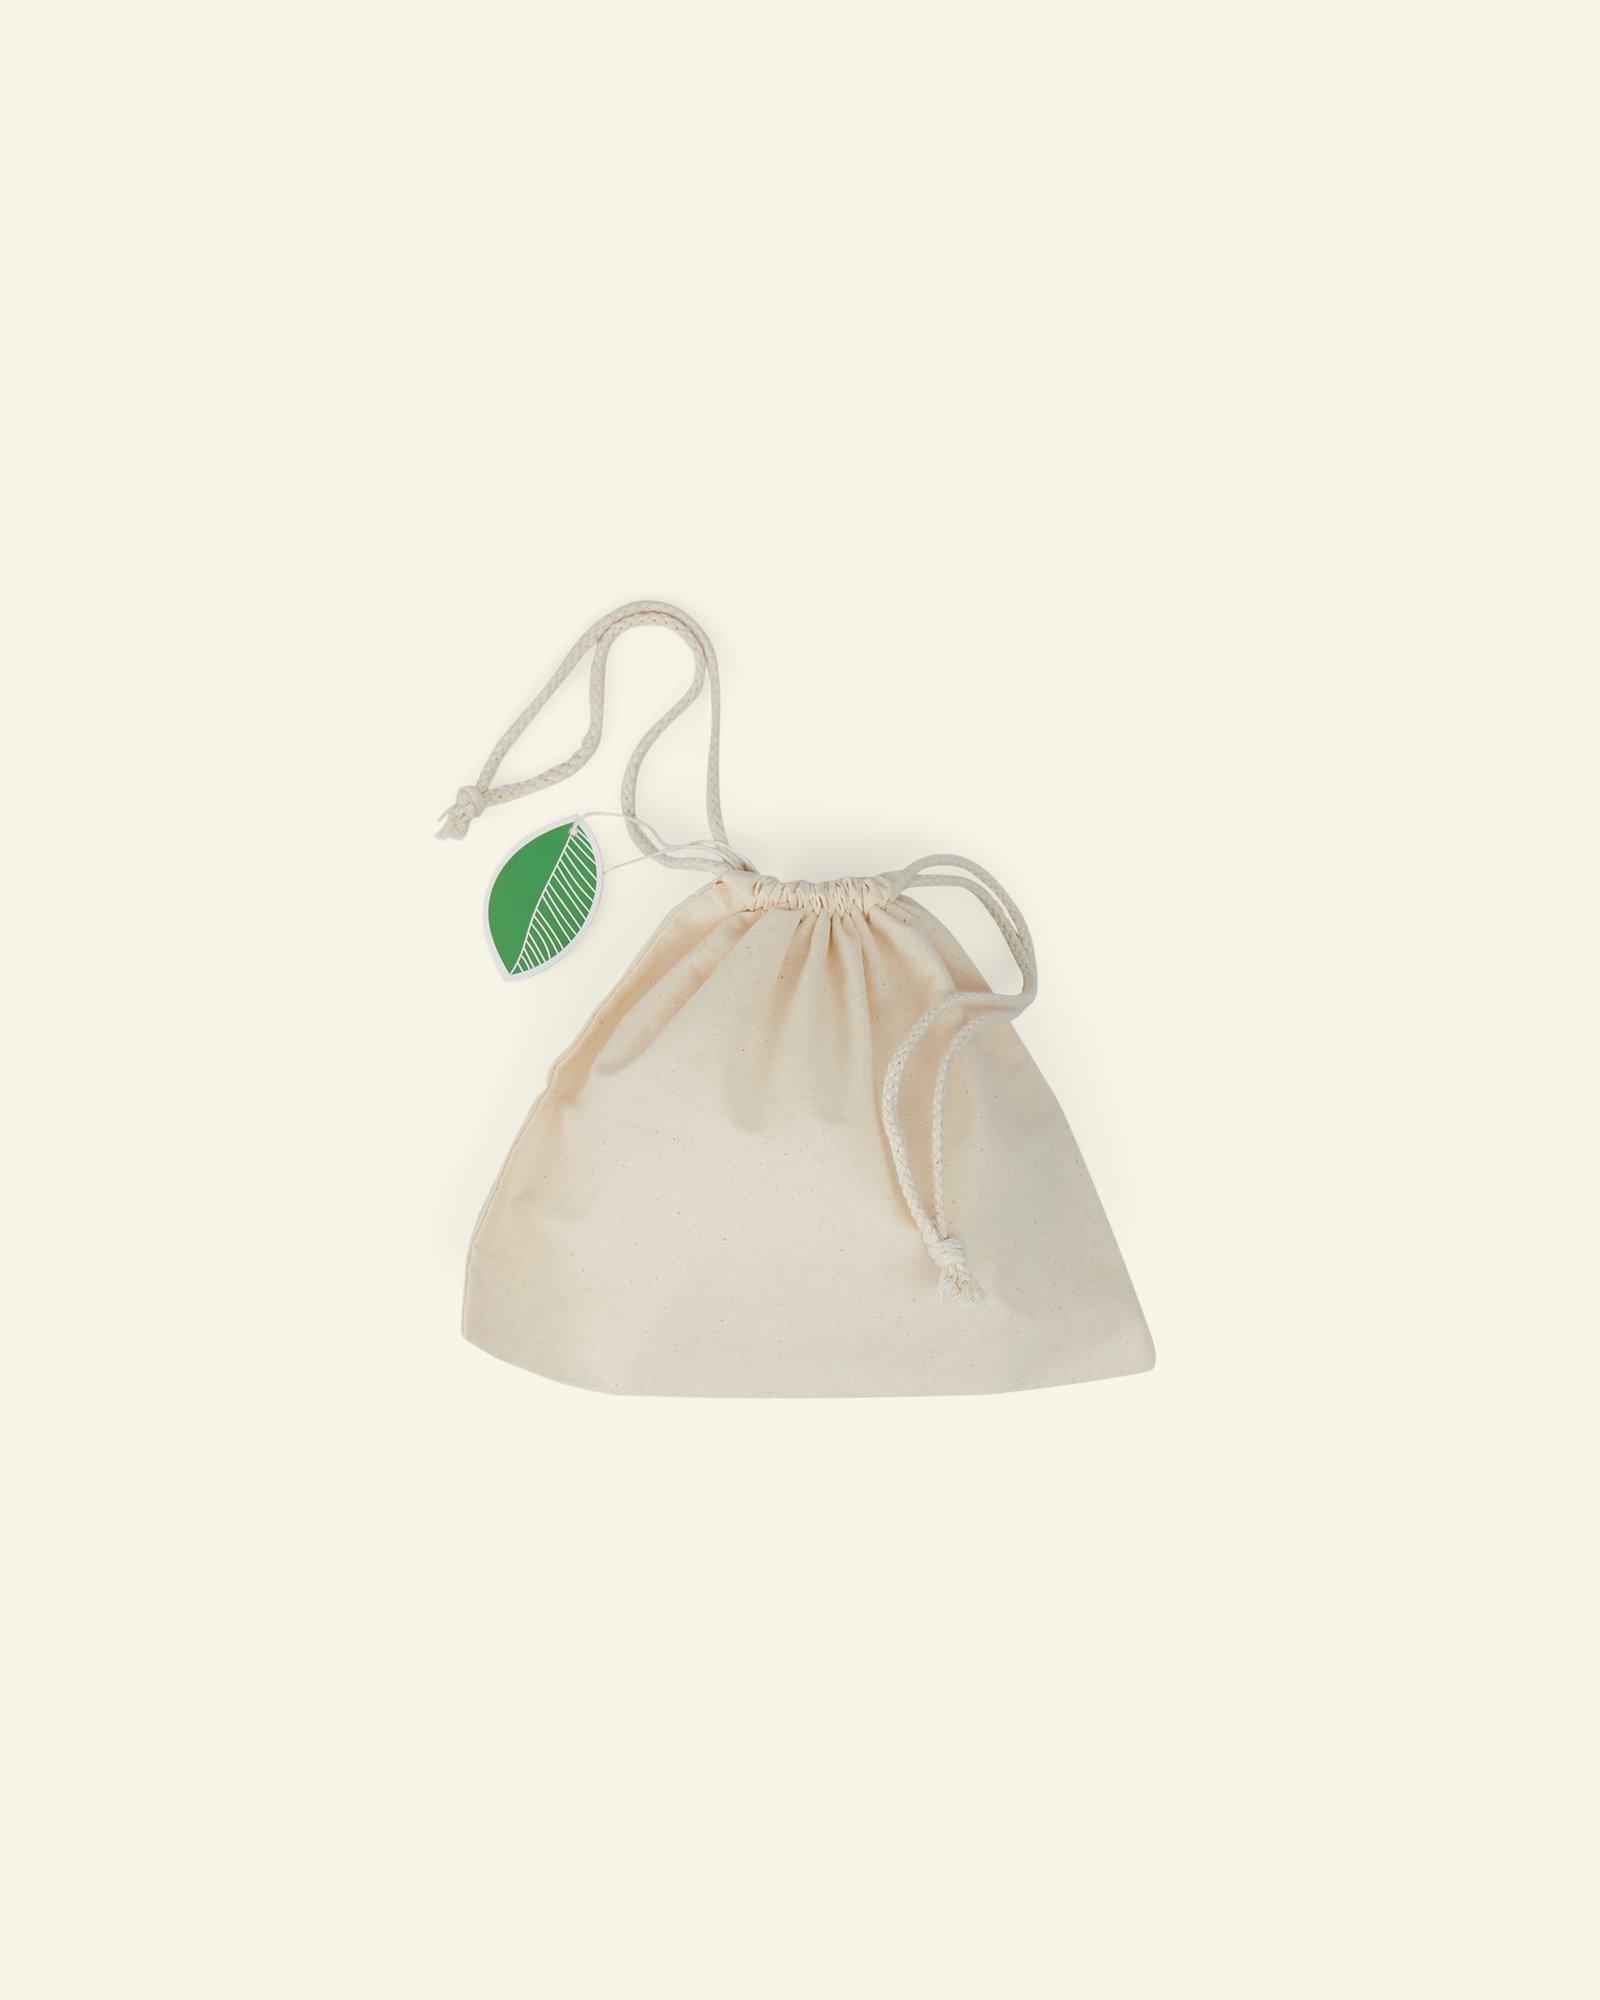 Organig drawstring bag 25*20 cm